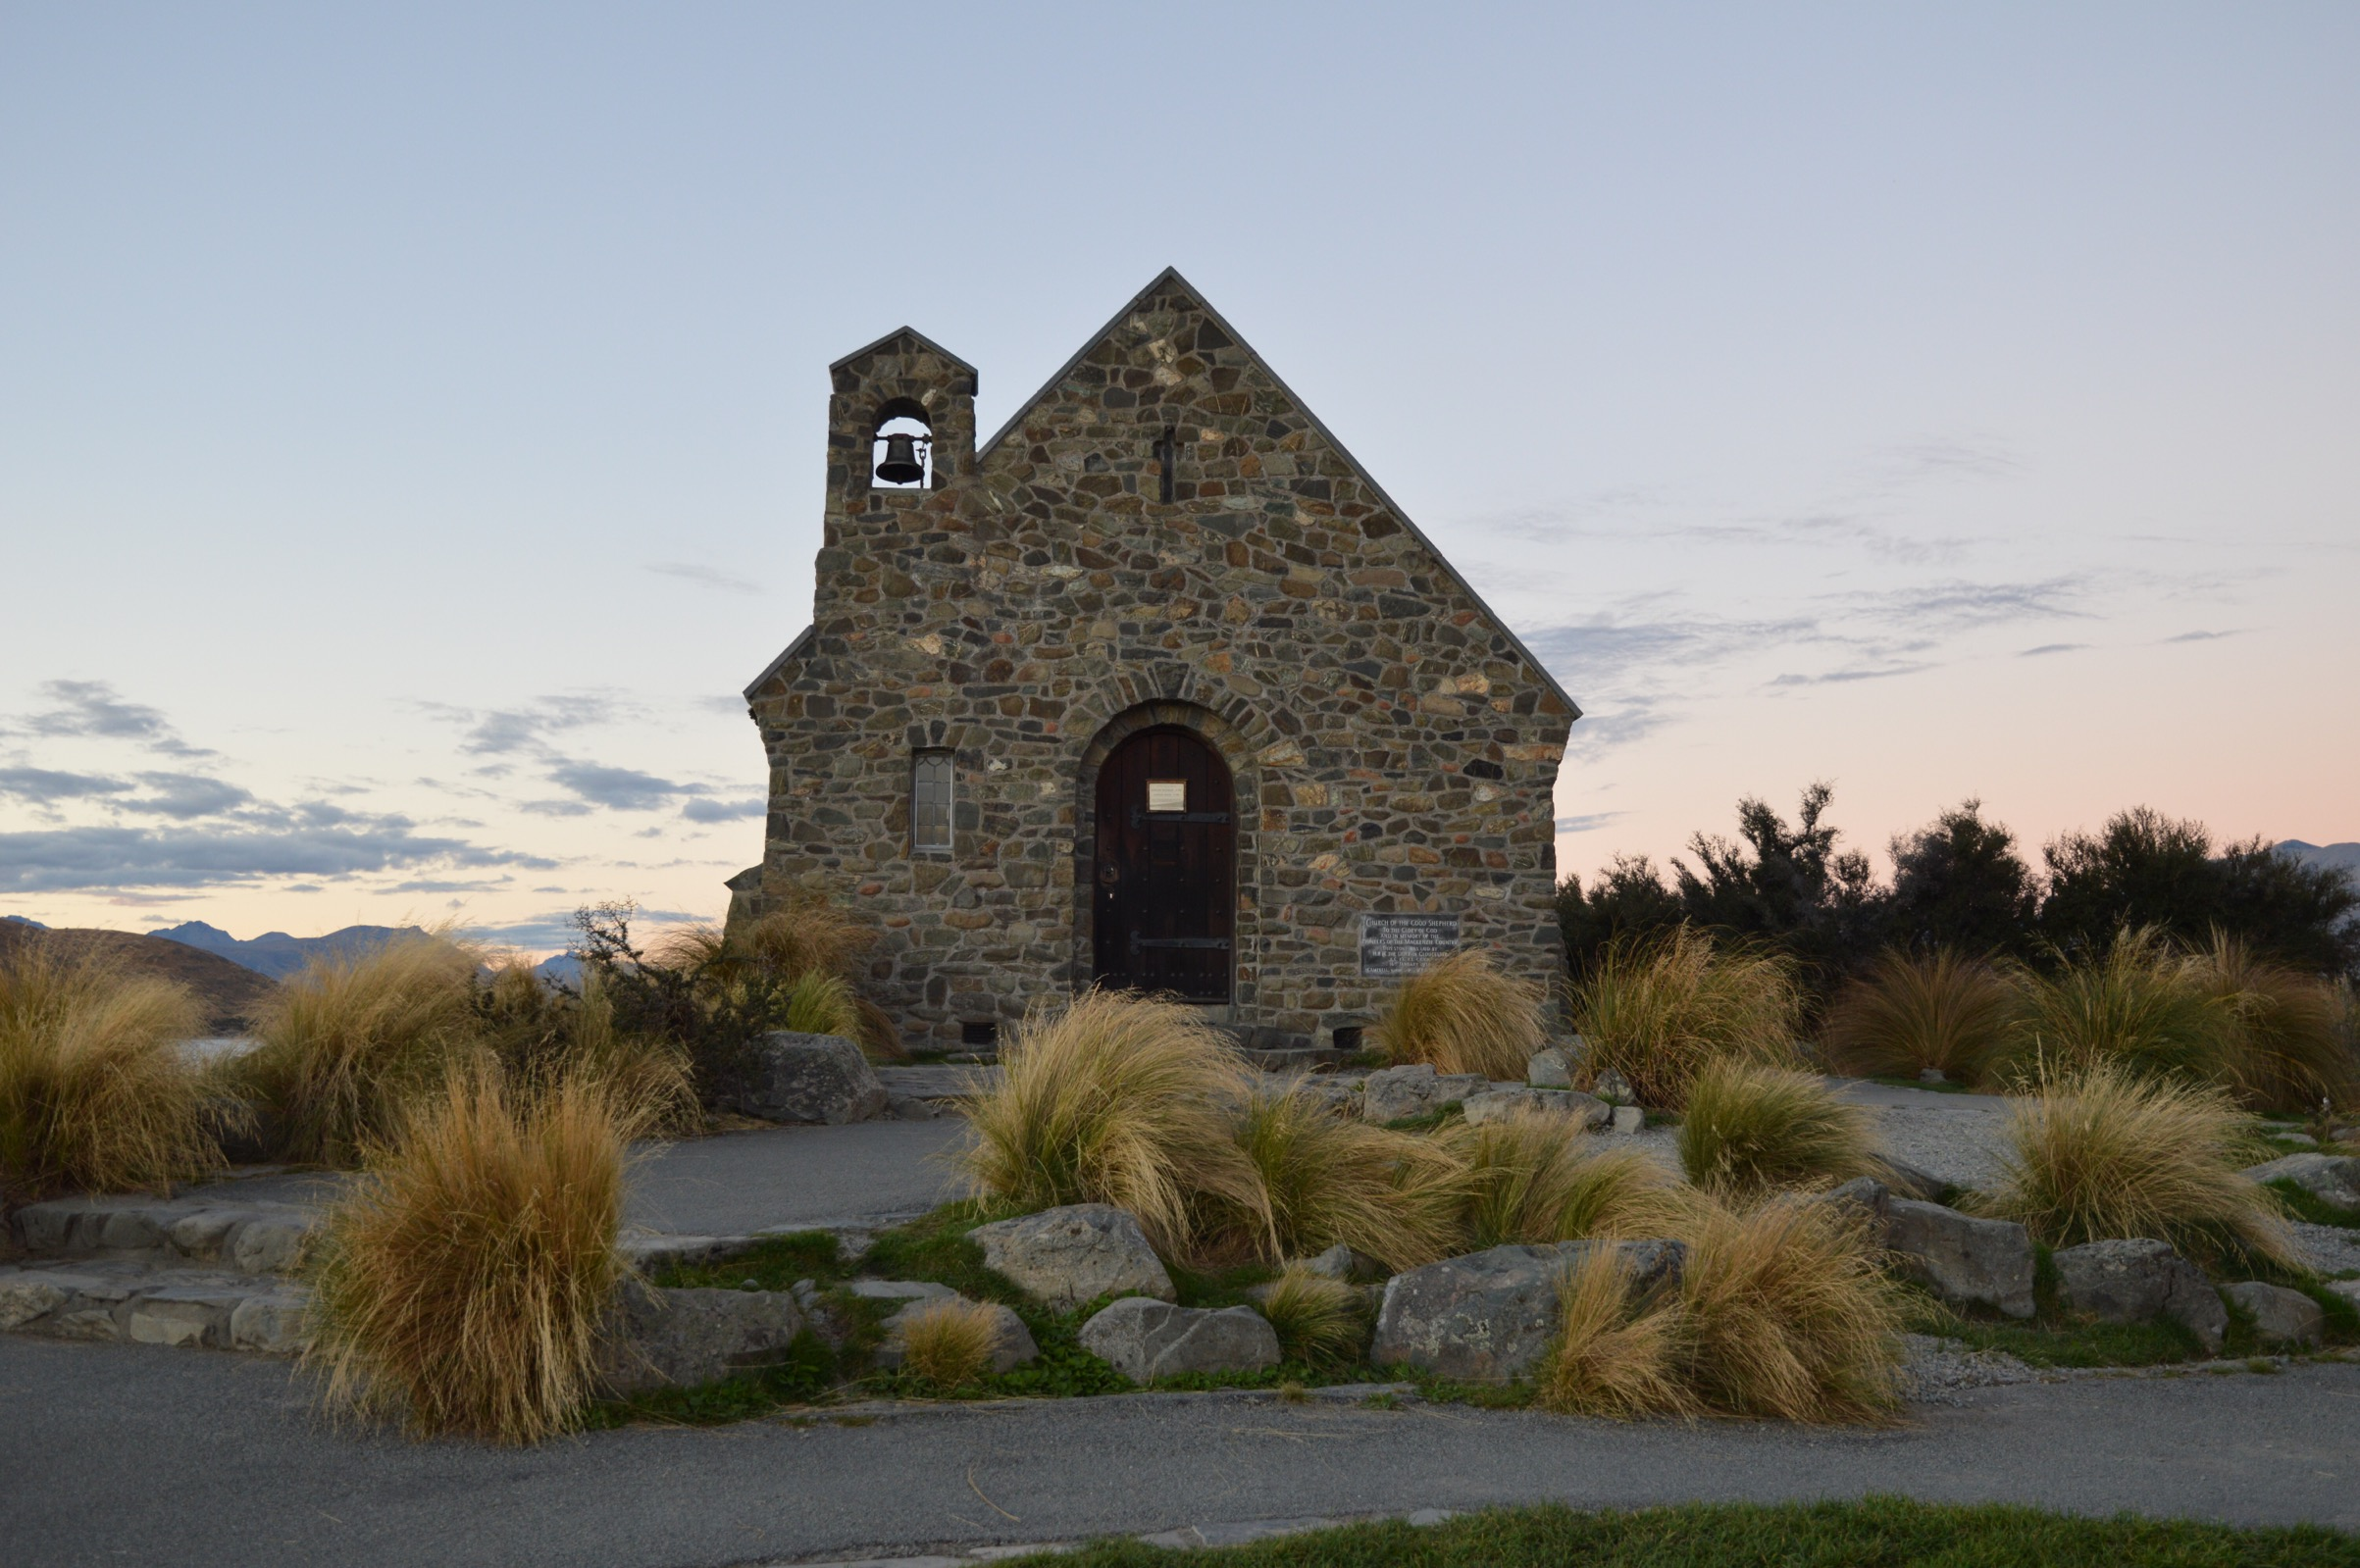 The Church of the Good Shepherd, Lake Tekapo, New Zealand